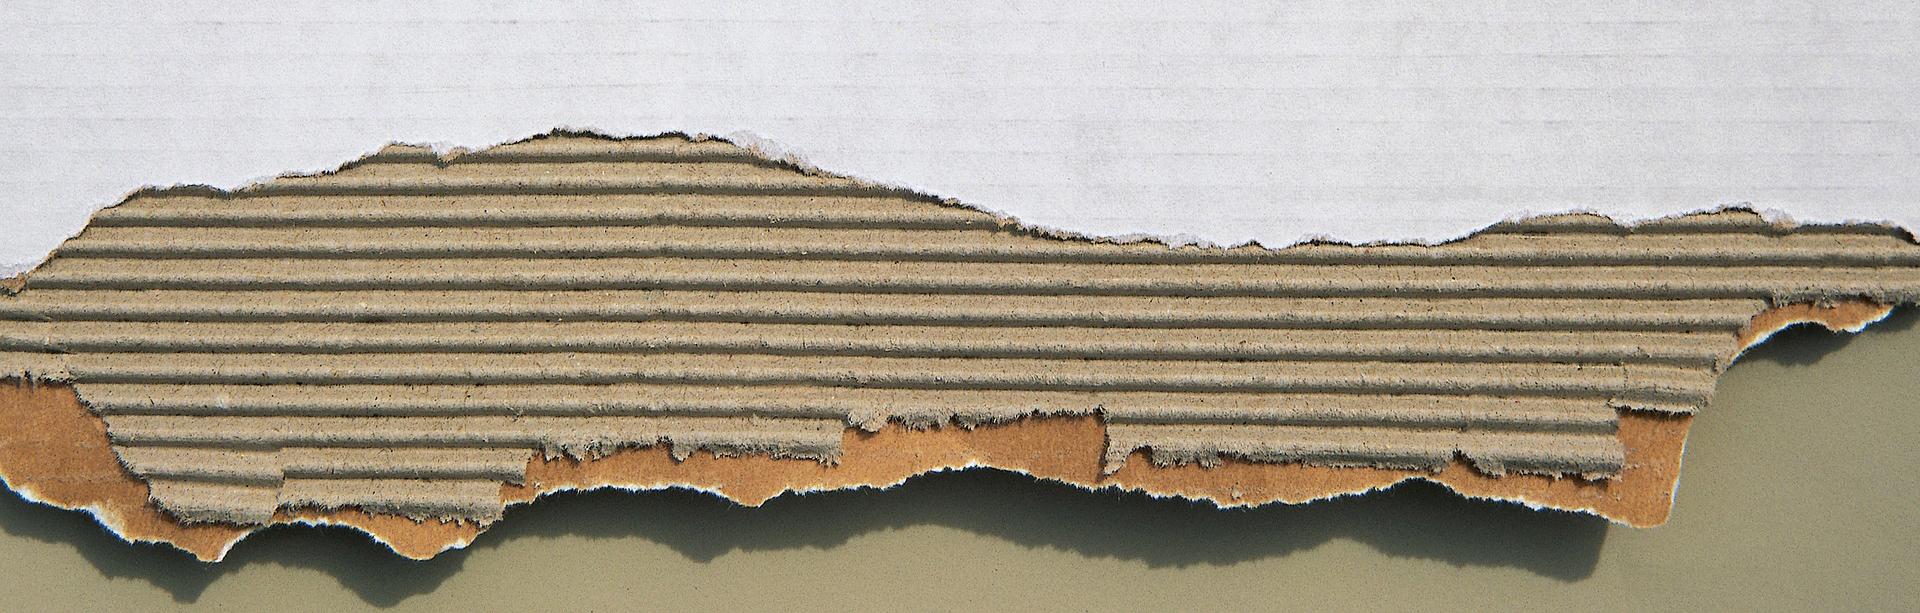 cardboard-267282_1920.jpg